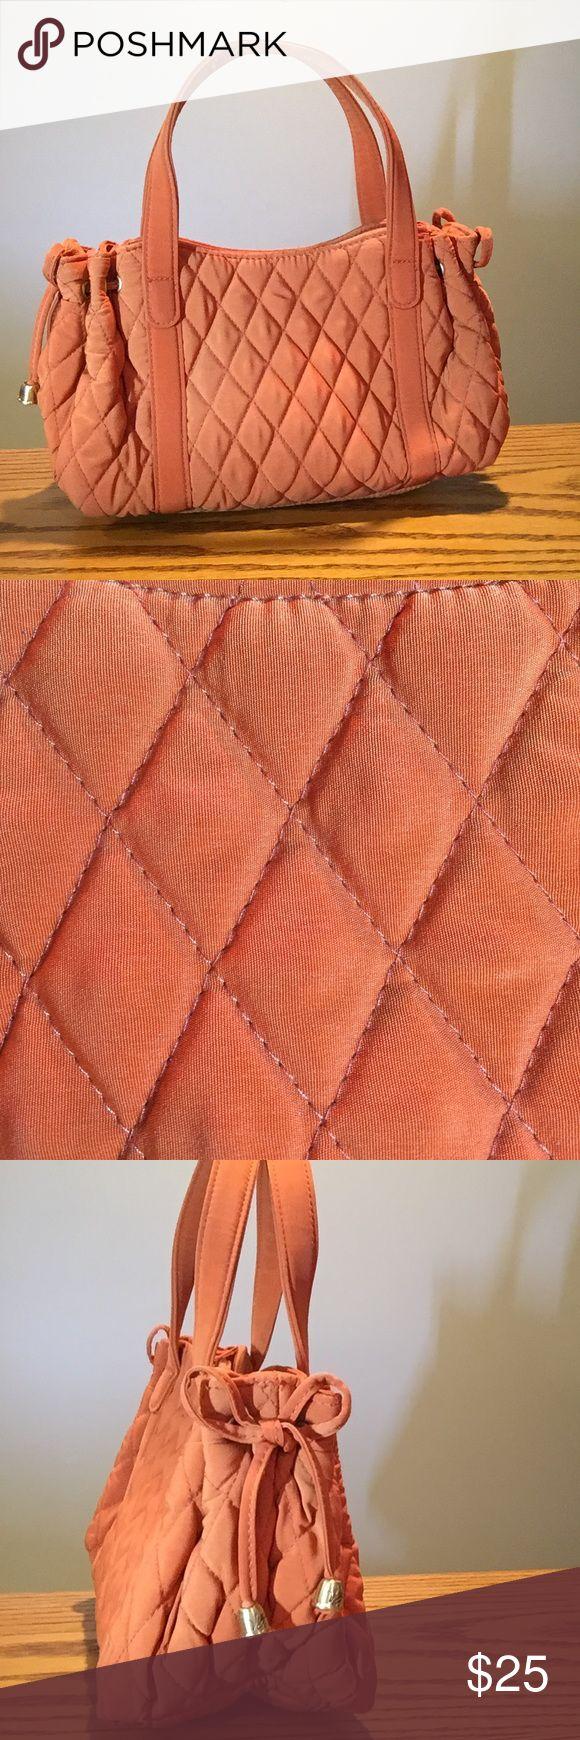 "Vera Bradley Orange Quilted wrist bag Like new Vera Bradley Orange Quilted wrist bag has snap closure and one inside pocket.  10x4x6"" Vera Bradley Bags"